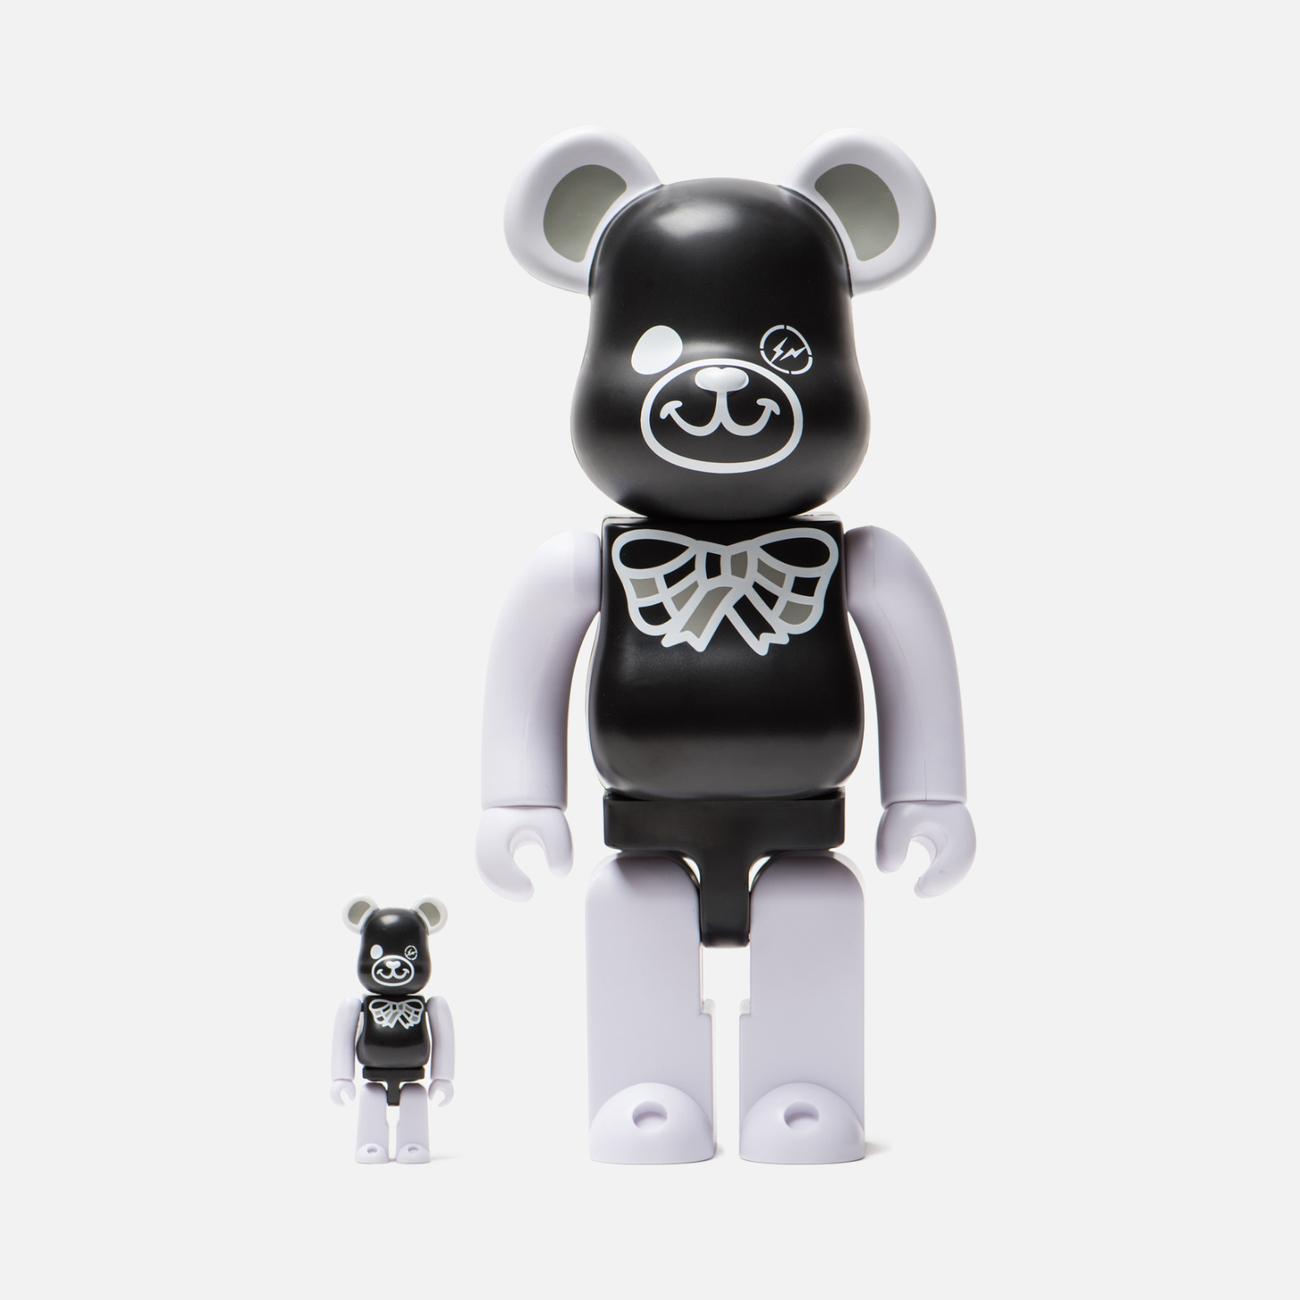 Игрушка Medicom Toy Bearbrick Freemasonry x Fragmentdesign Black Set 100% & 400%